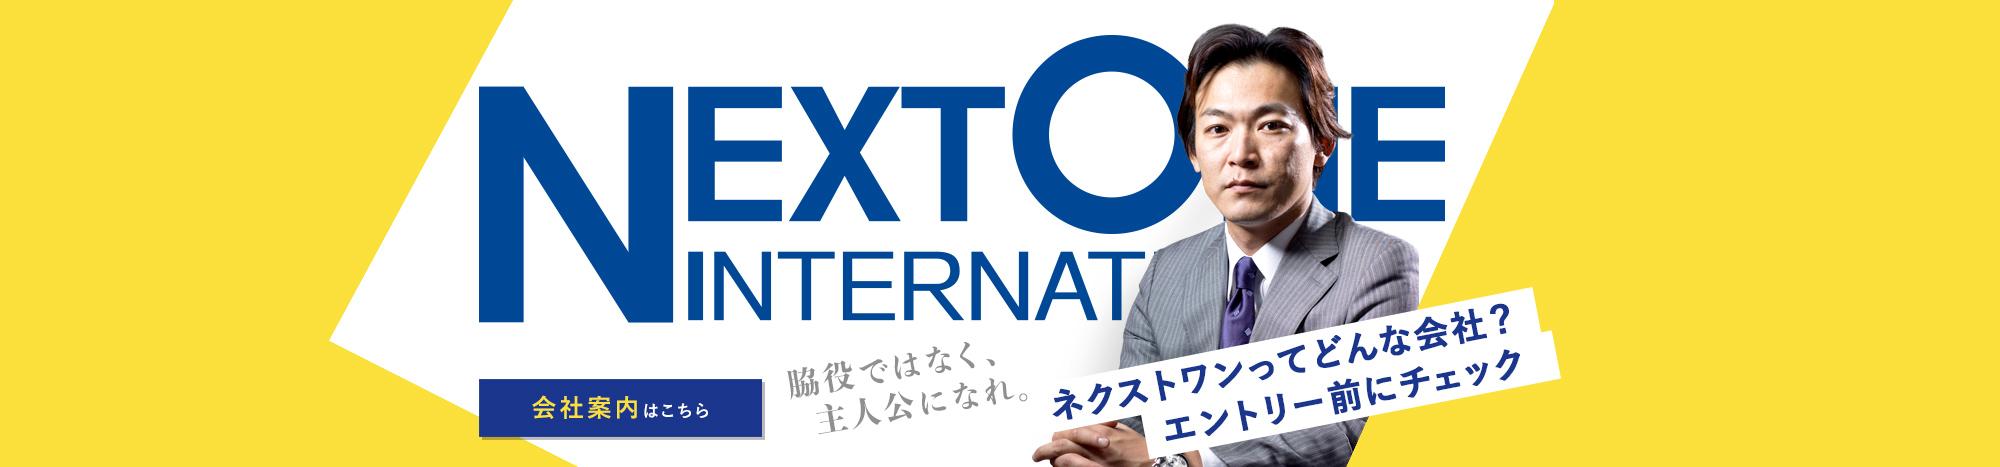 NEXTONE INTERNATIONAL 会社案内はこちら。ネクストワンってどんな会社?エントリー前にチェック